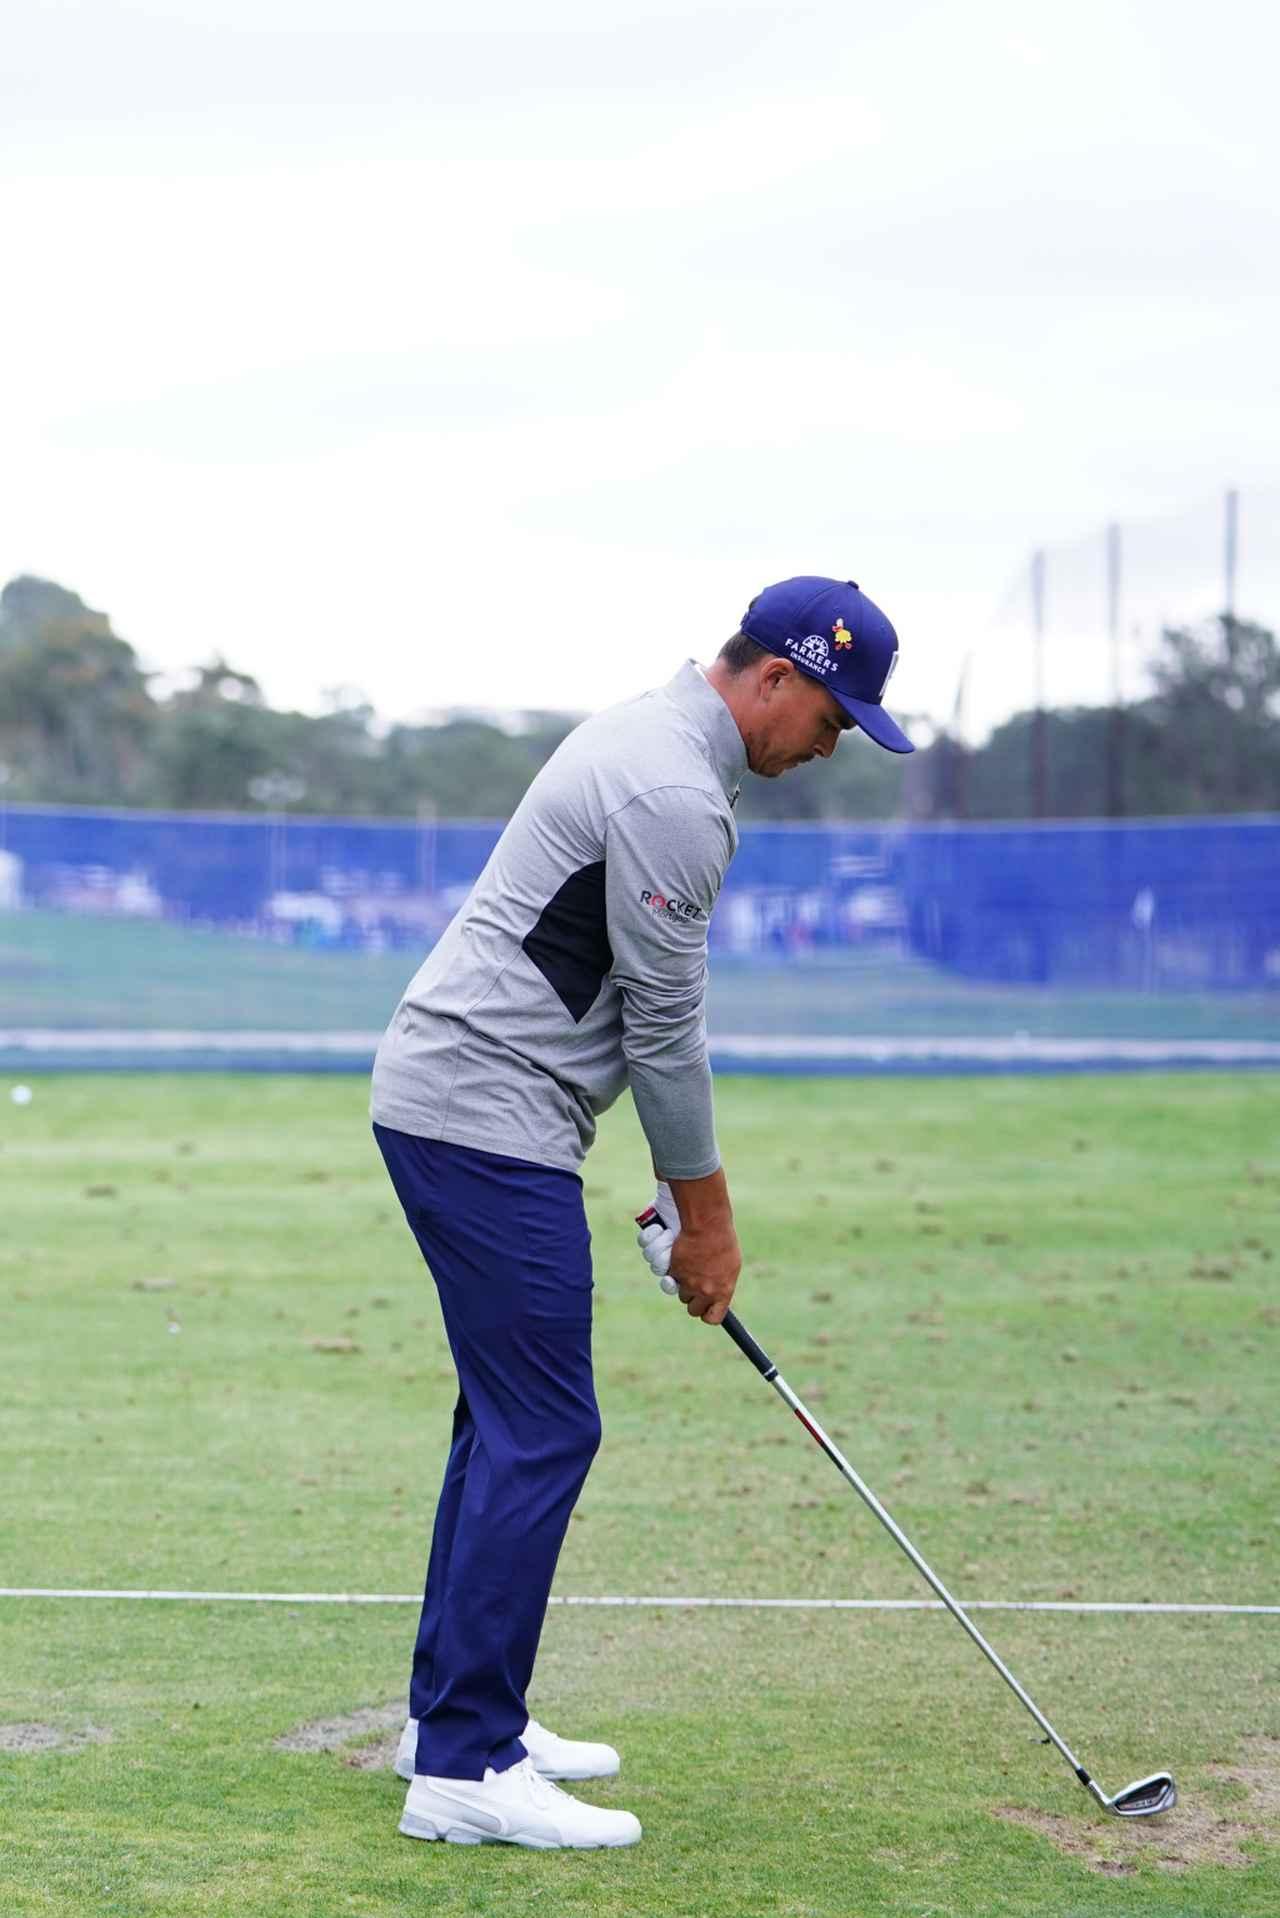 Images : 1番目の画像 - リッキー・ファウラーの最新アイアン連続写真 - みんなのゴルフダイジェスト